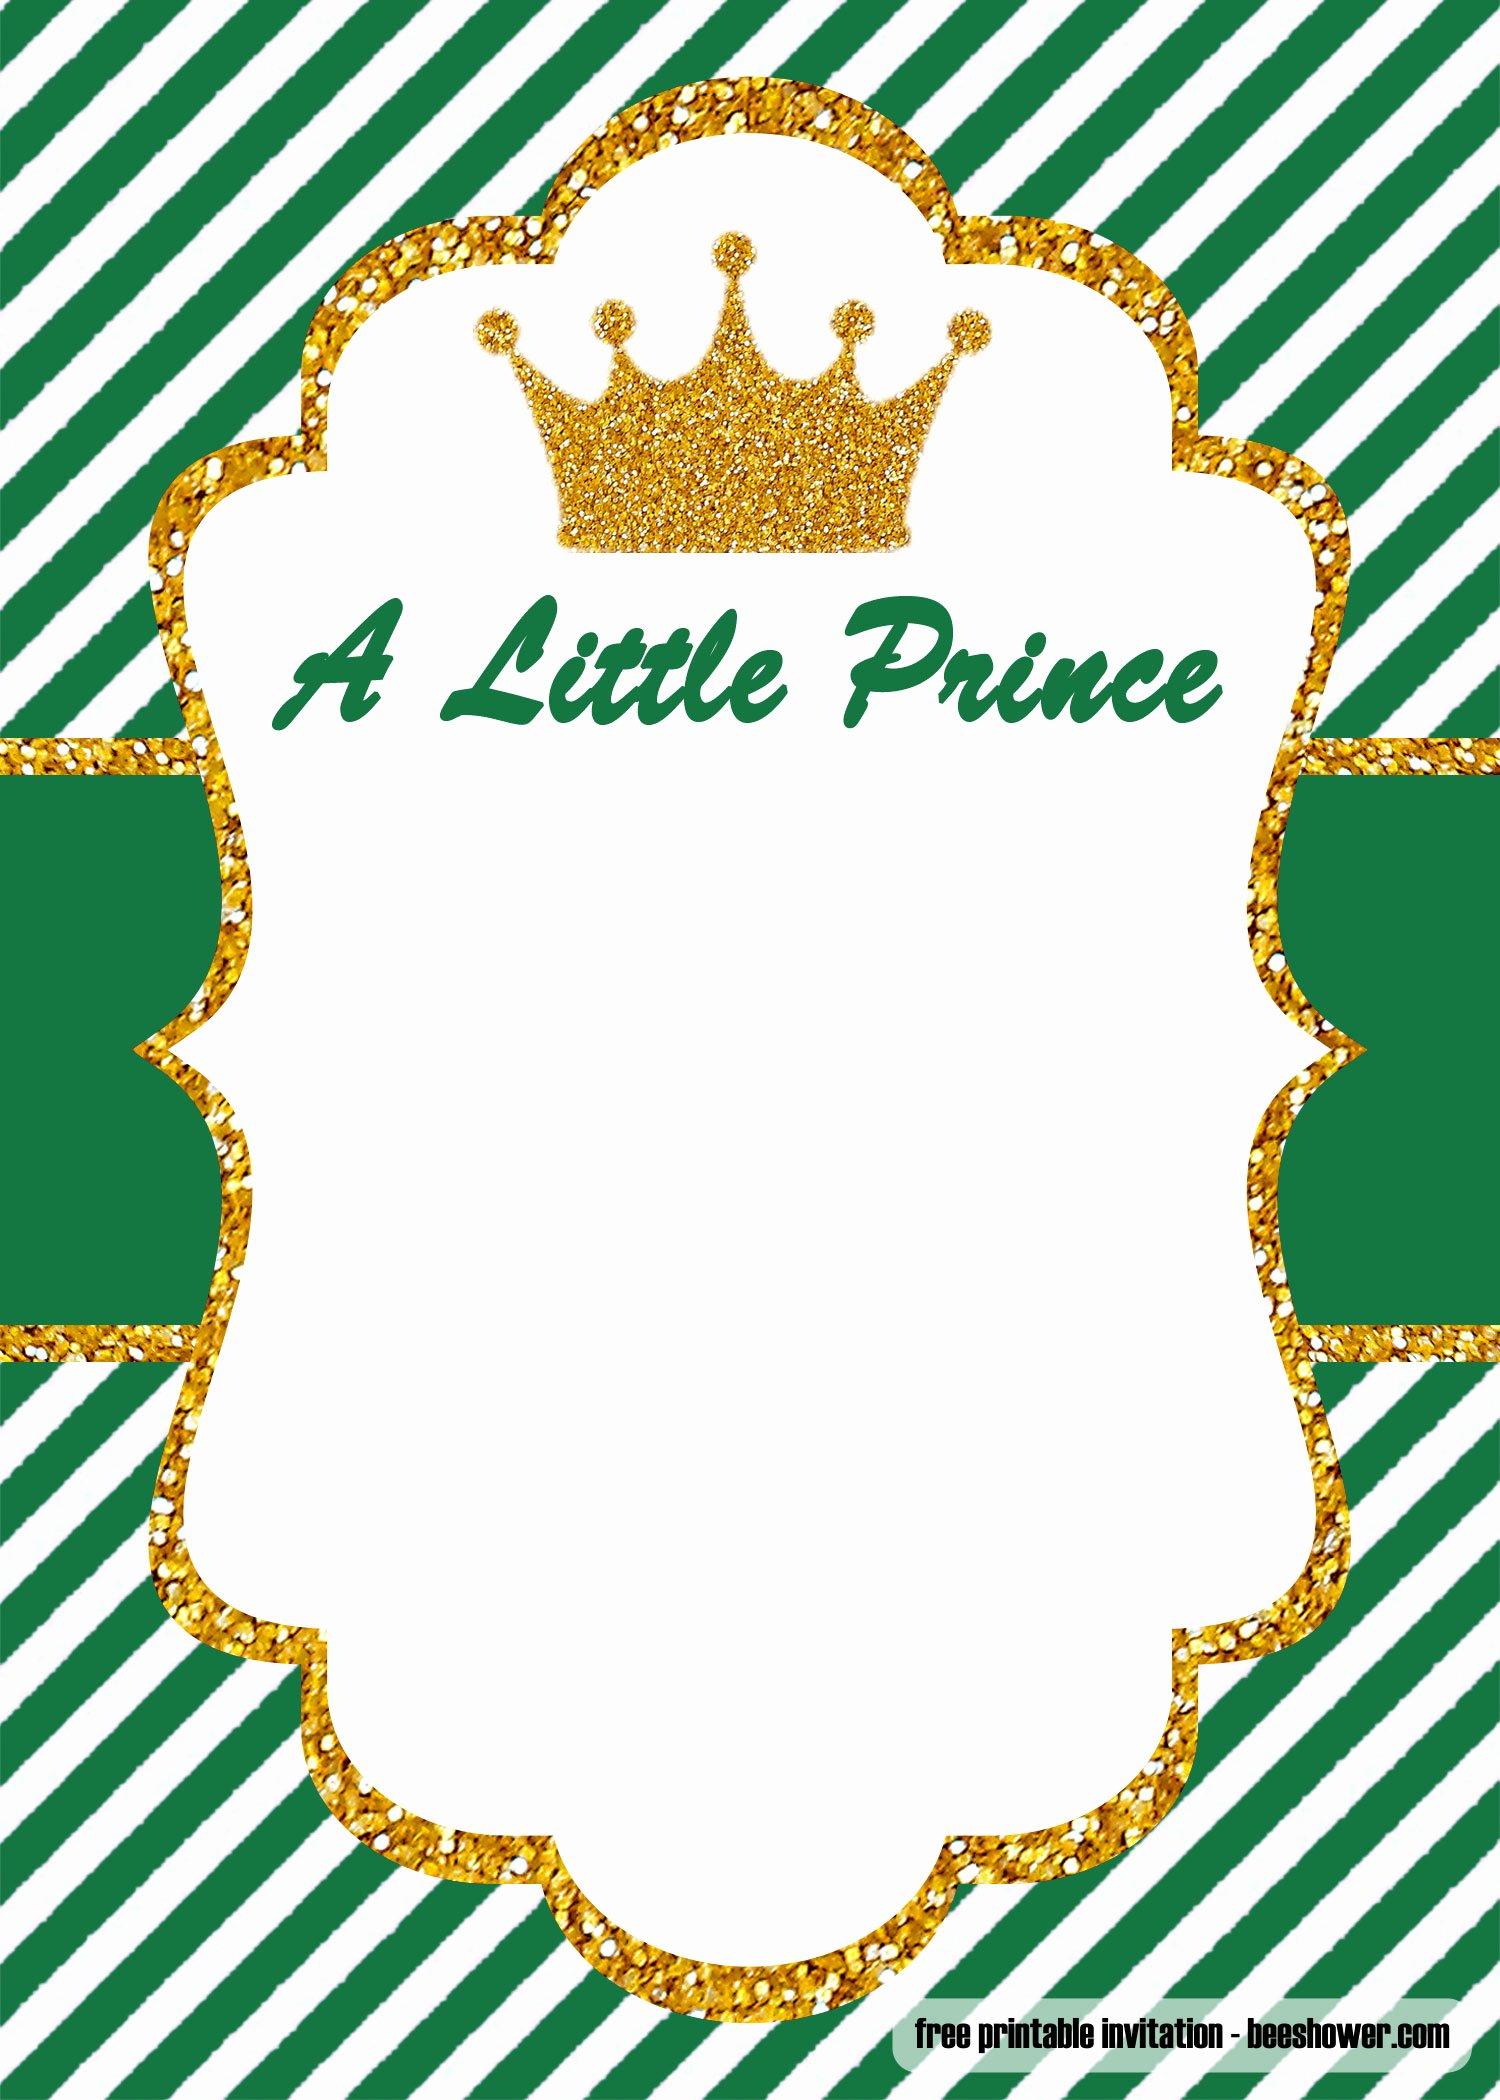 Baby Shower Invite Template Elegant Free Prince Baby Shower Invitations Templates